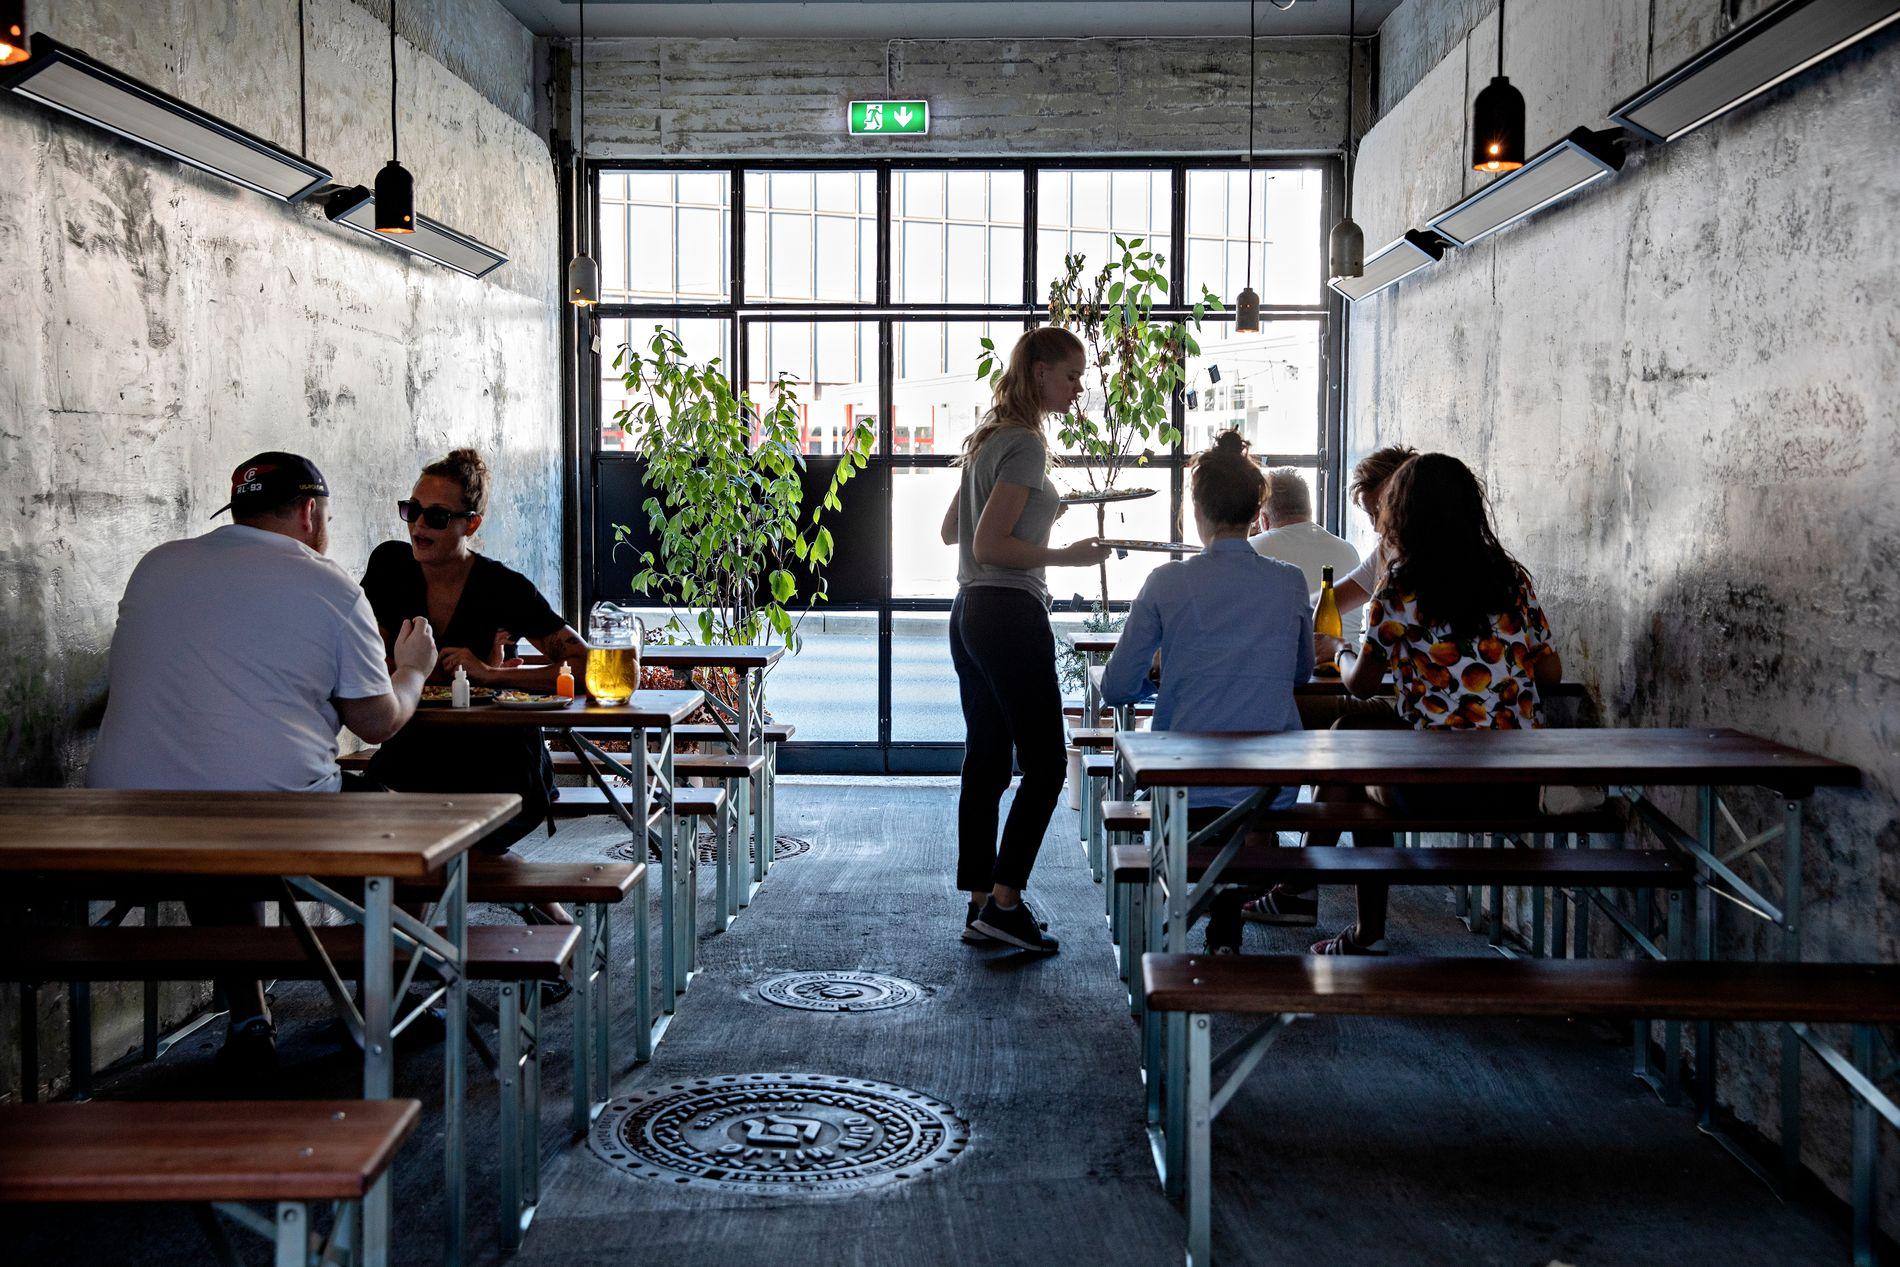 NY RESTAURANT: Pizzarestauranten Hoggorm i Nygårdsgaten har en litt annerledes bakgård.